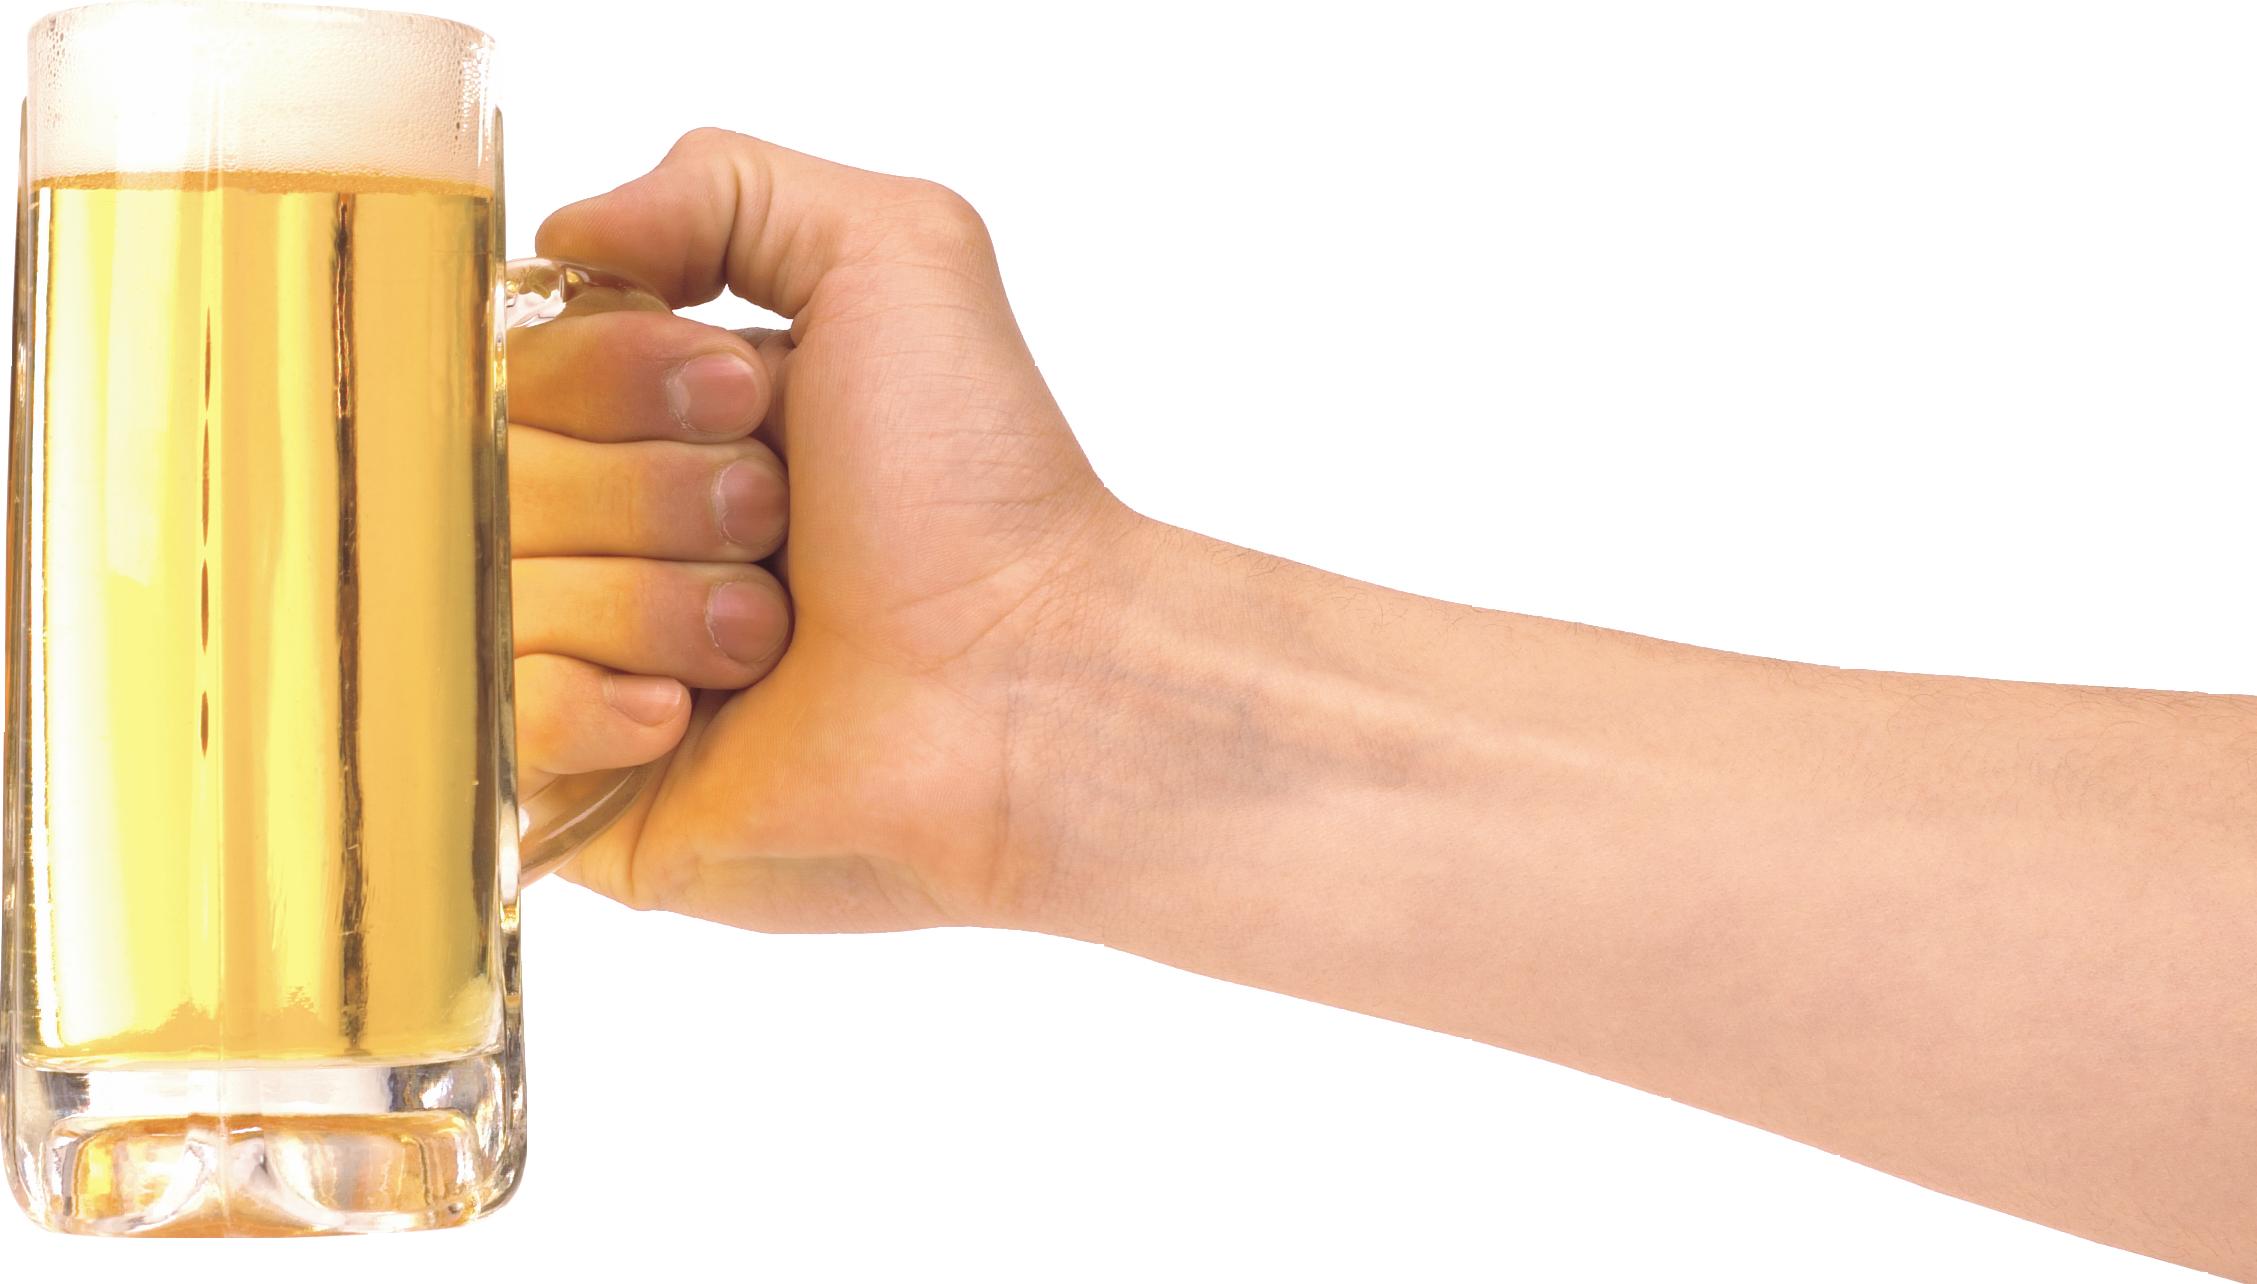 One clipart foam finger. Hand holding glass of